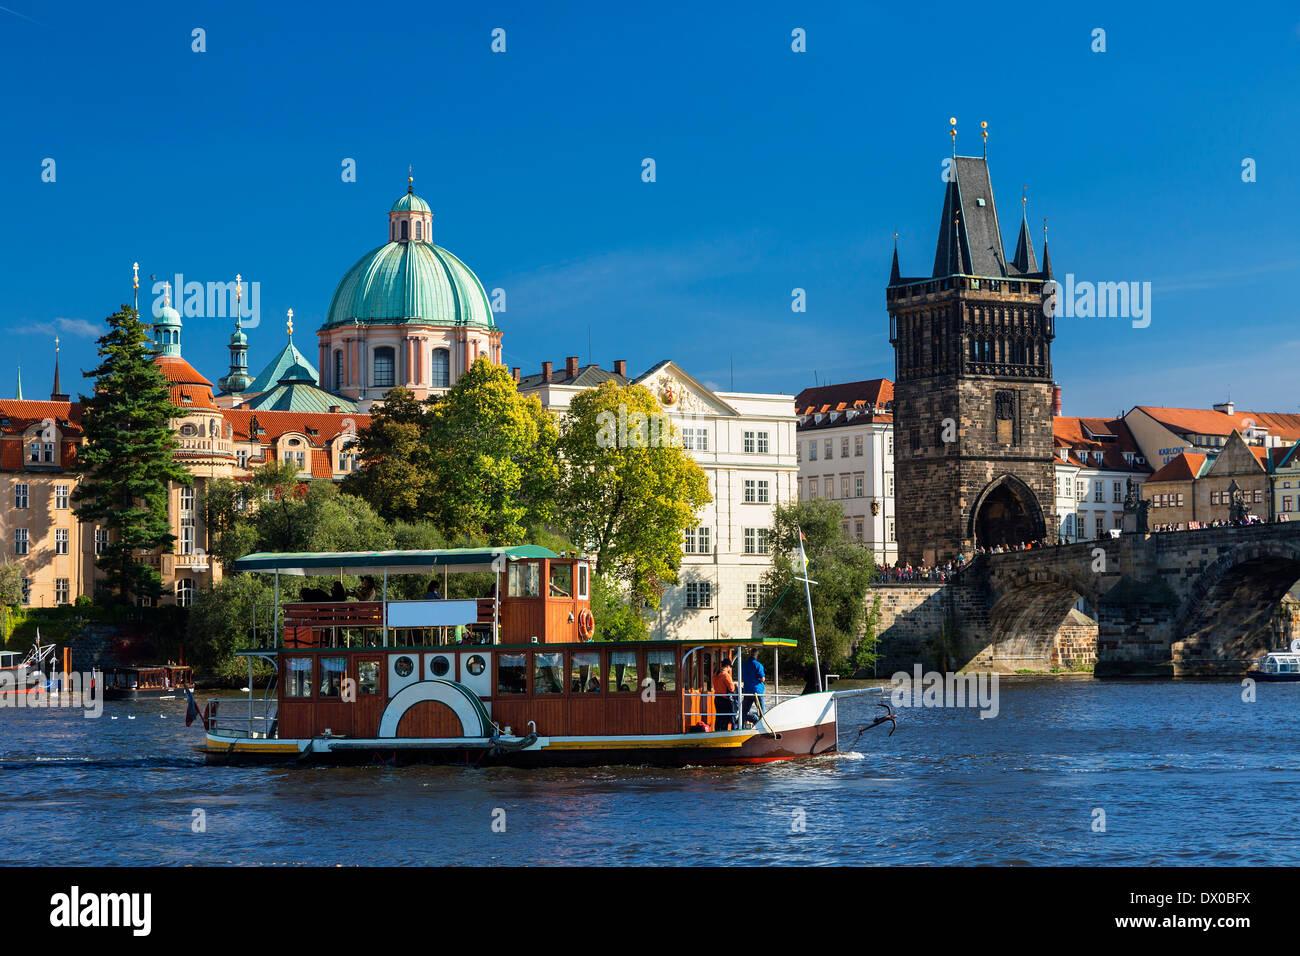 Prague, Tour boat on Vltava River - Stock Image